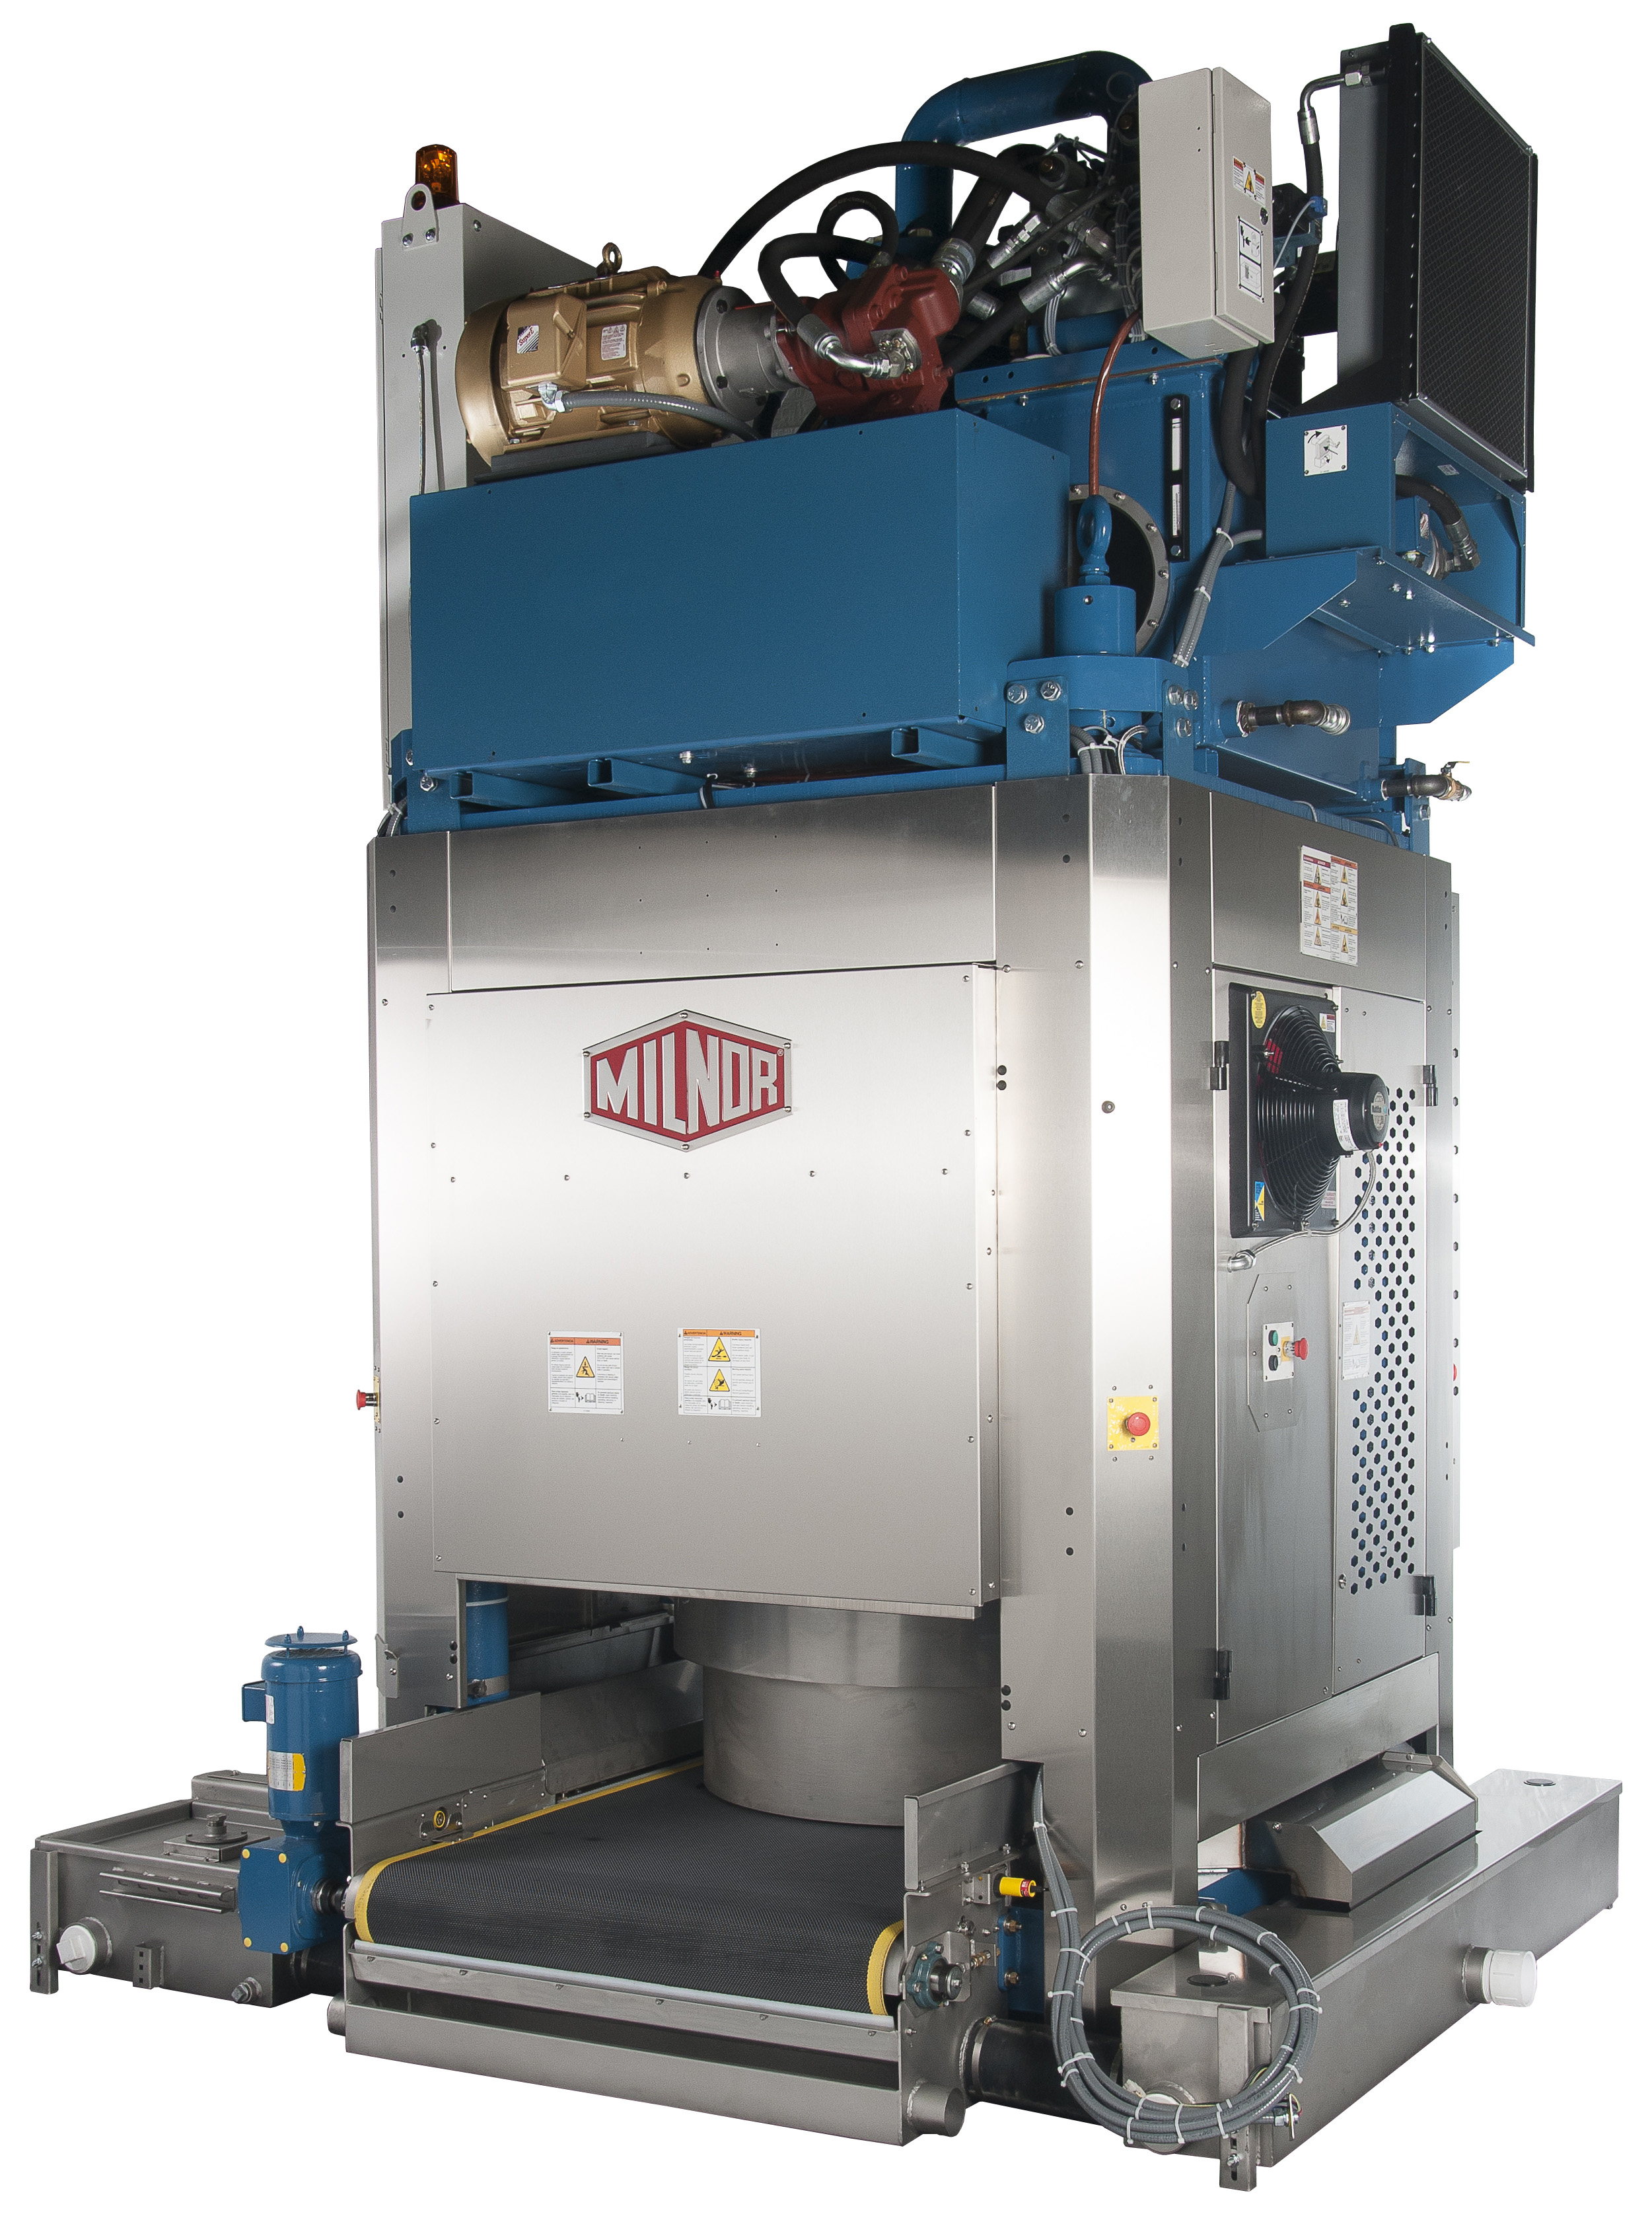 Milnor Washer Extractor ~ Mp pellerin milnor corporation